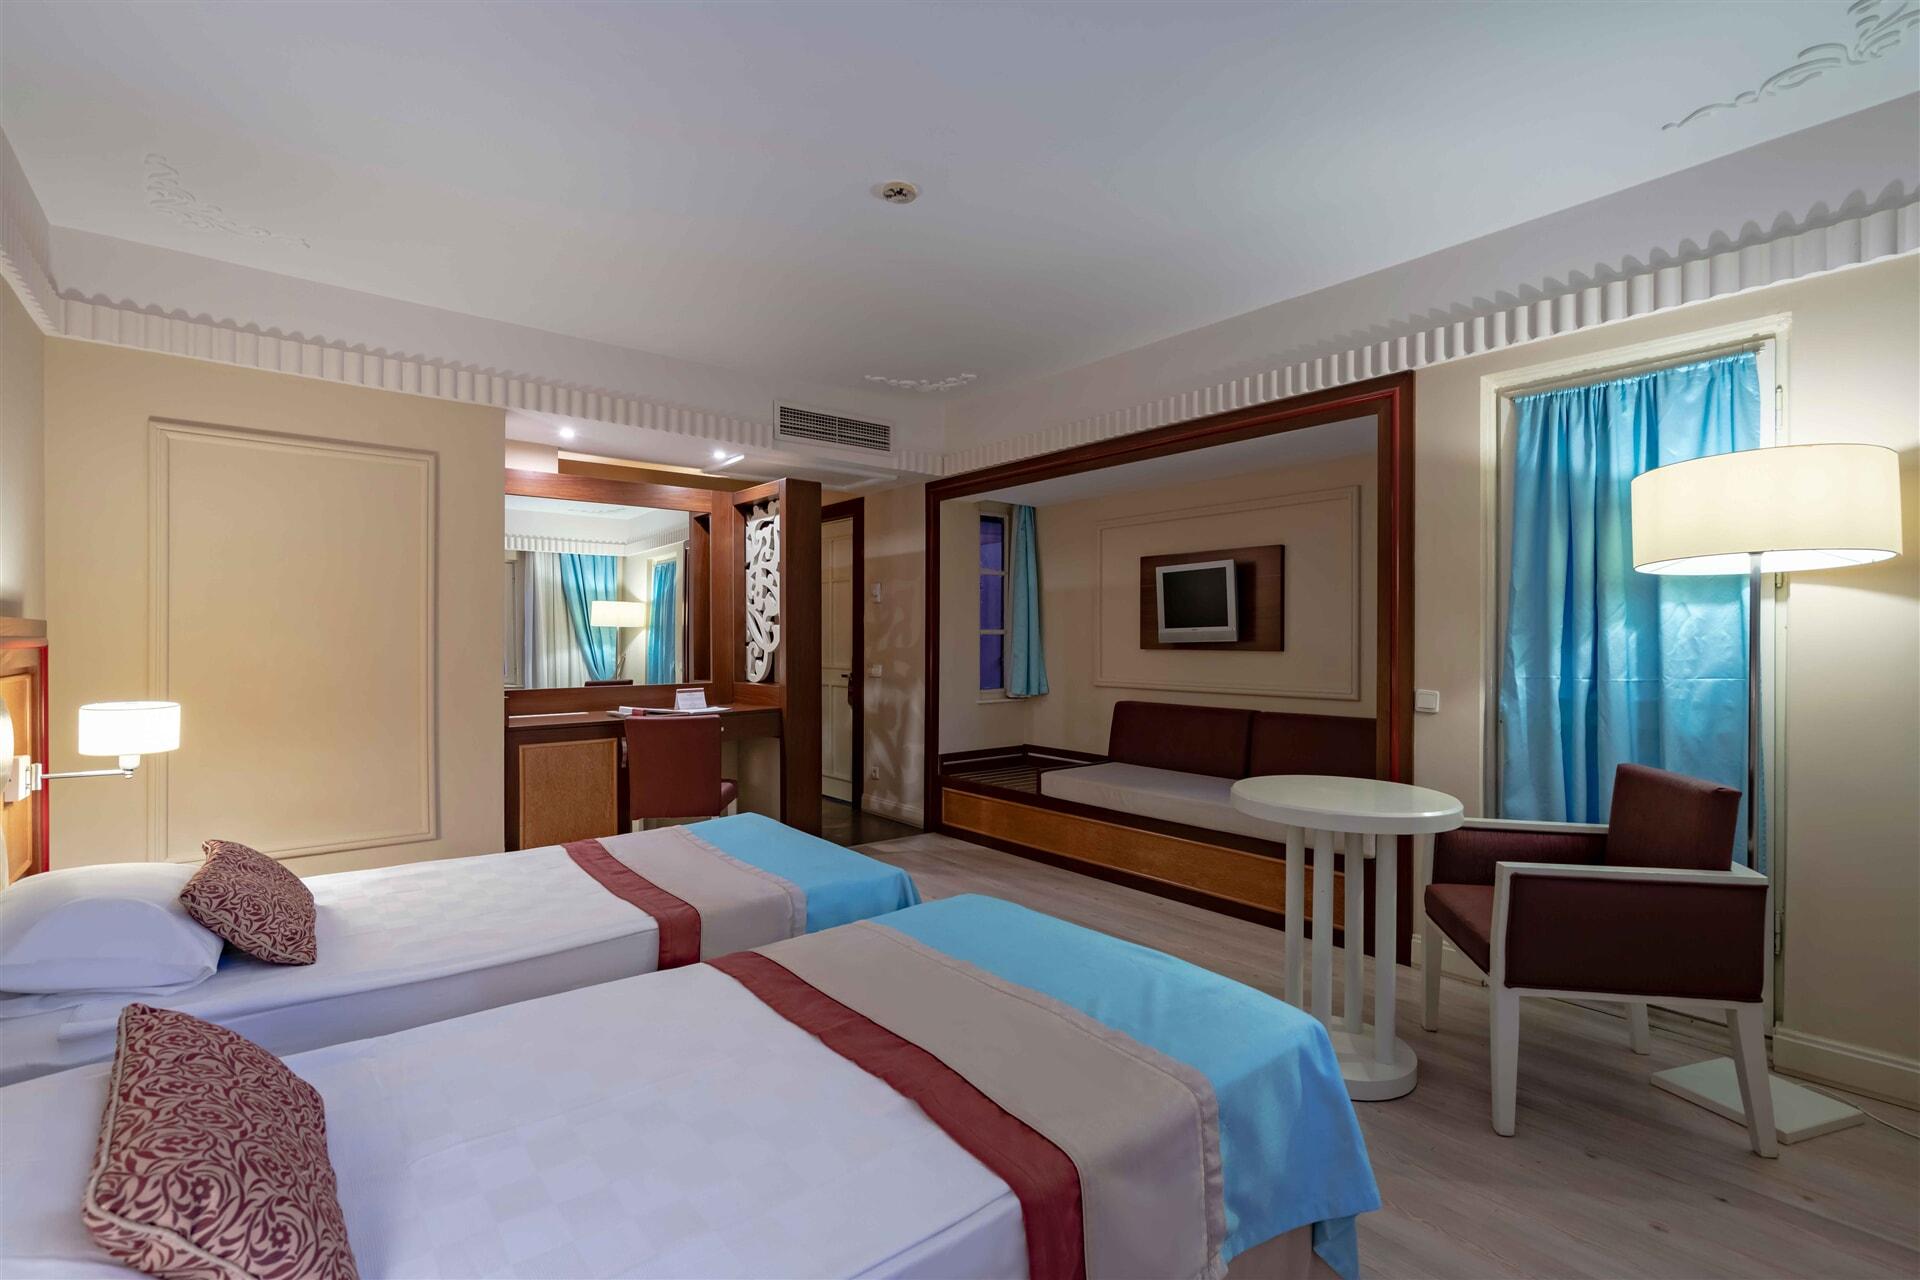 EUPHORIA TEKİROVA HOTEL – Standart Club Room